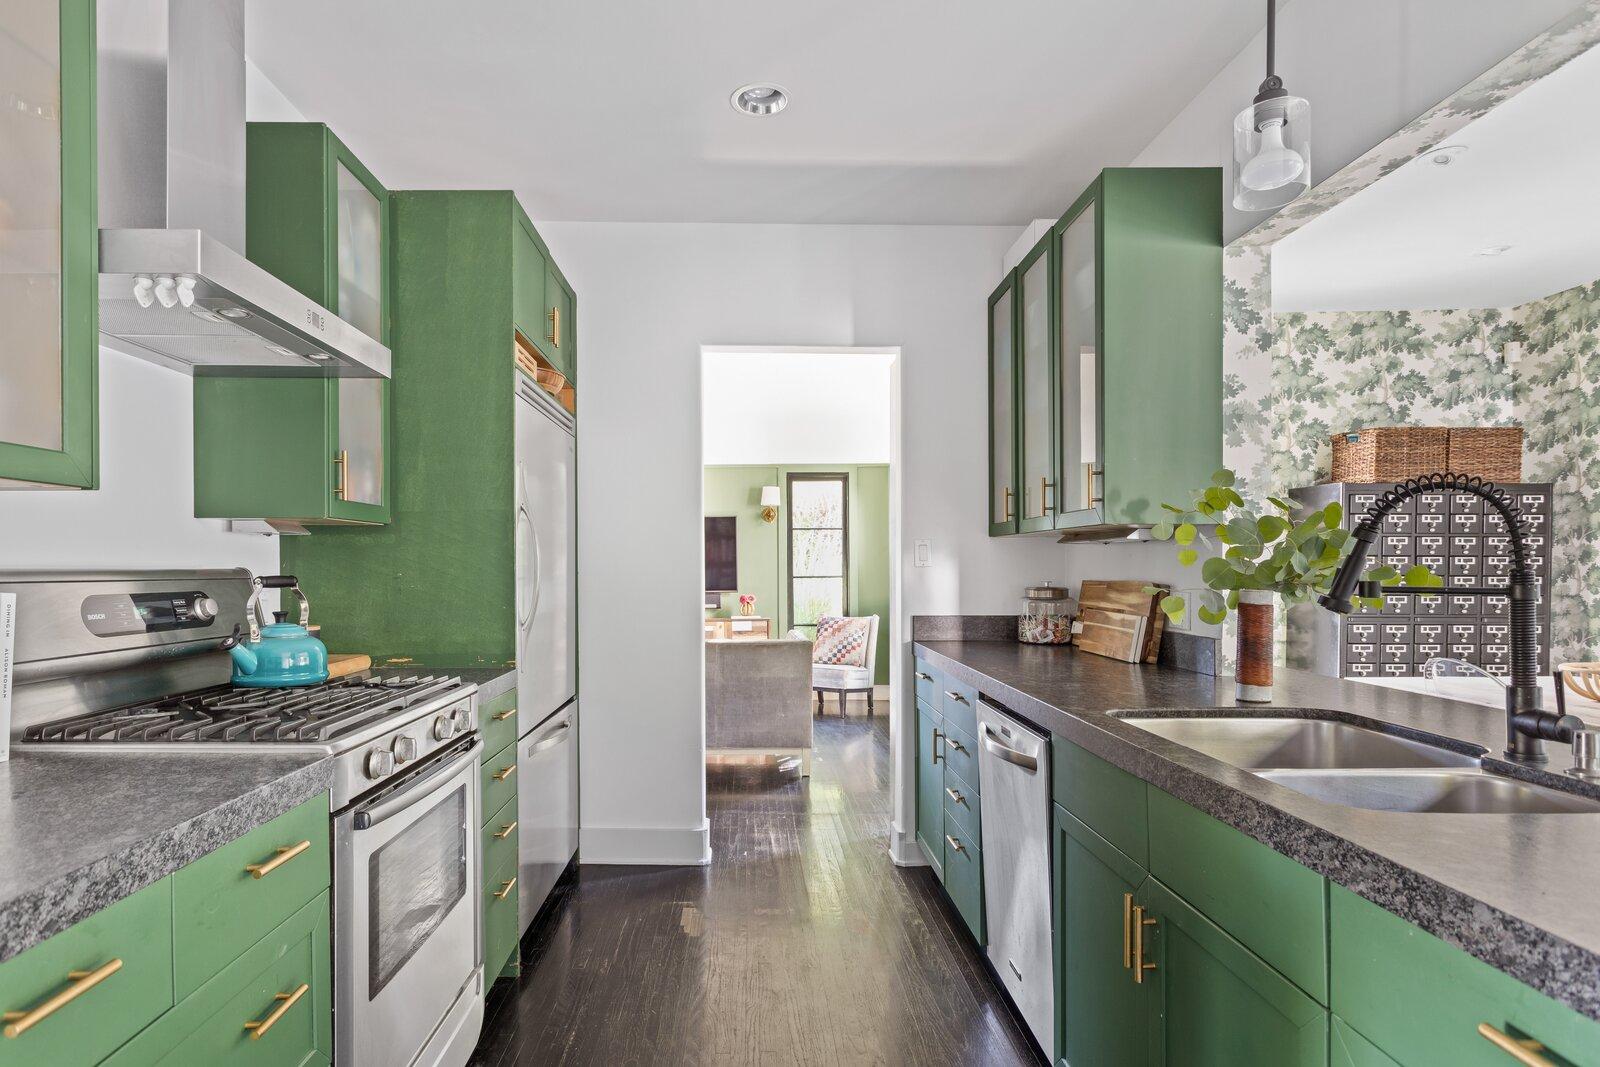 1920s Spanish Revival home kitchen